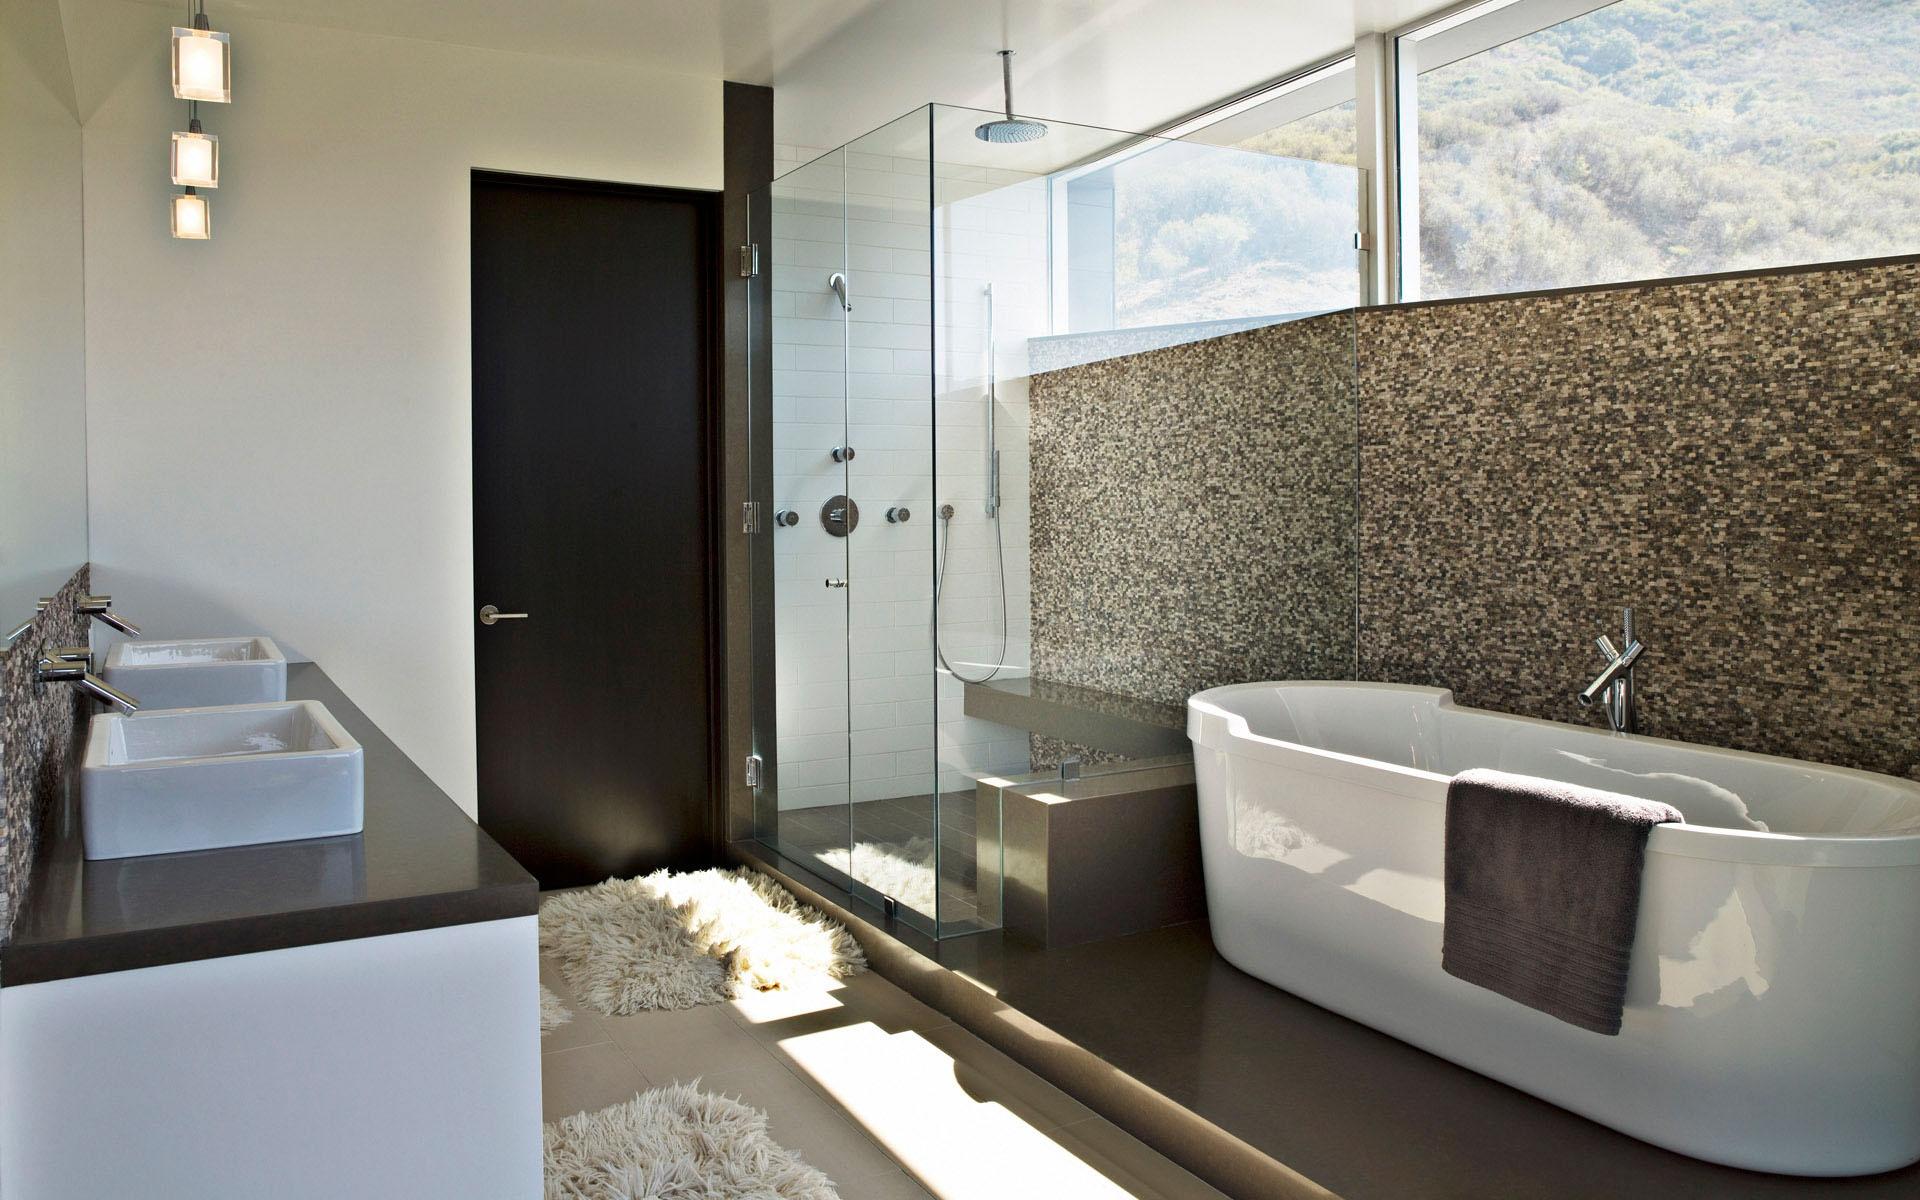 bathroom-design-bath-design1920-x-1200-572-kb-jpeg-x